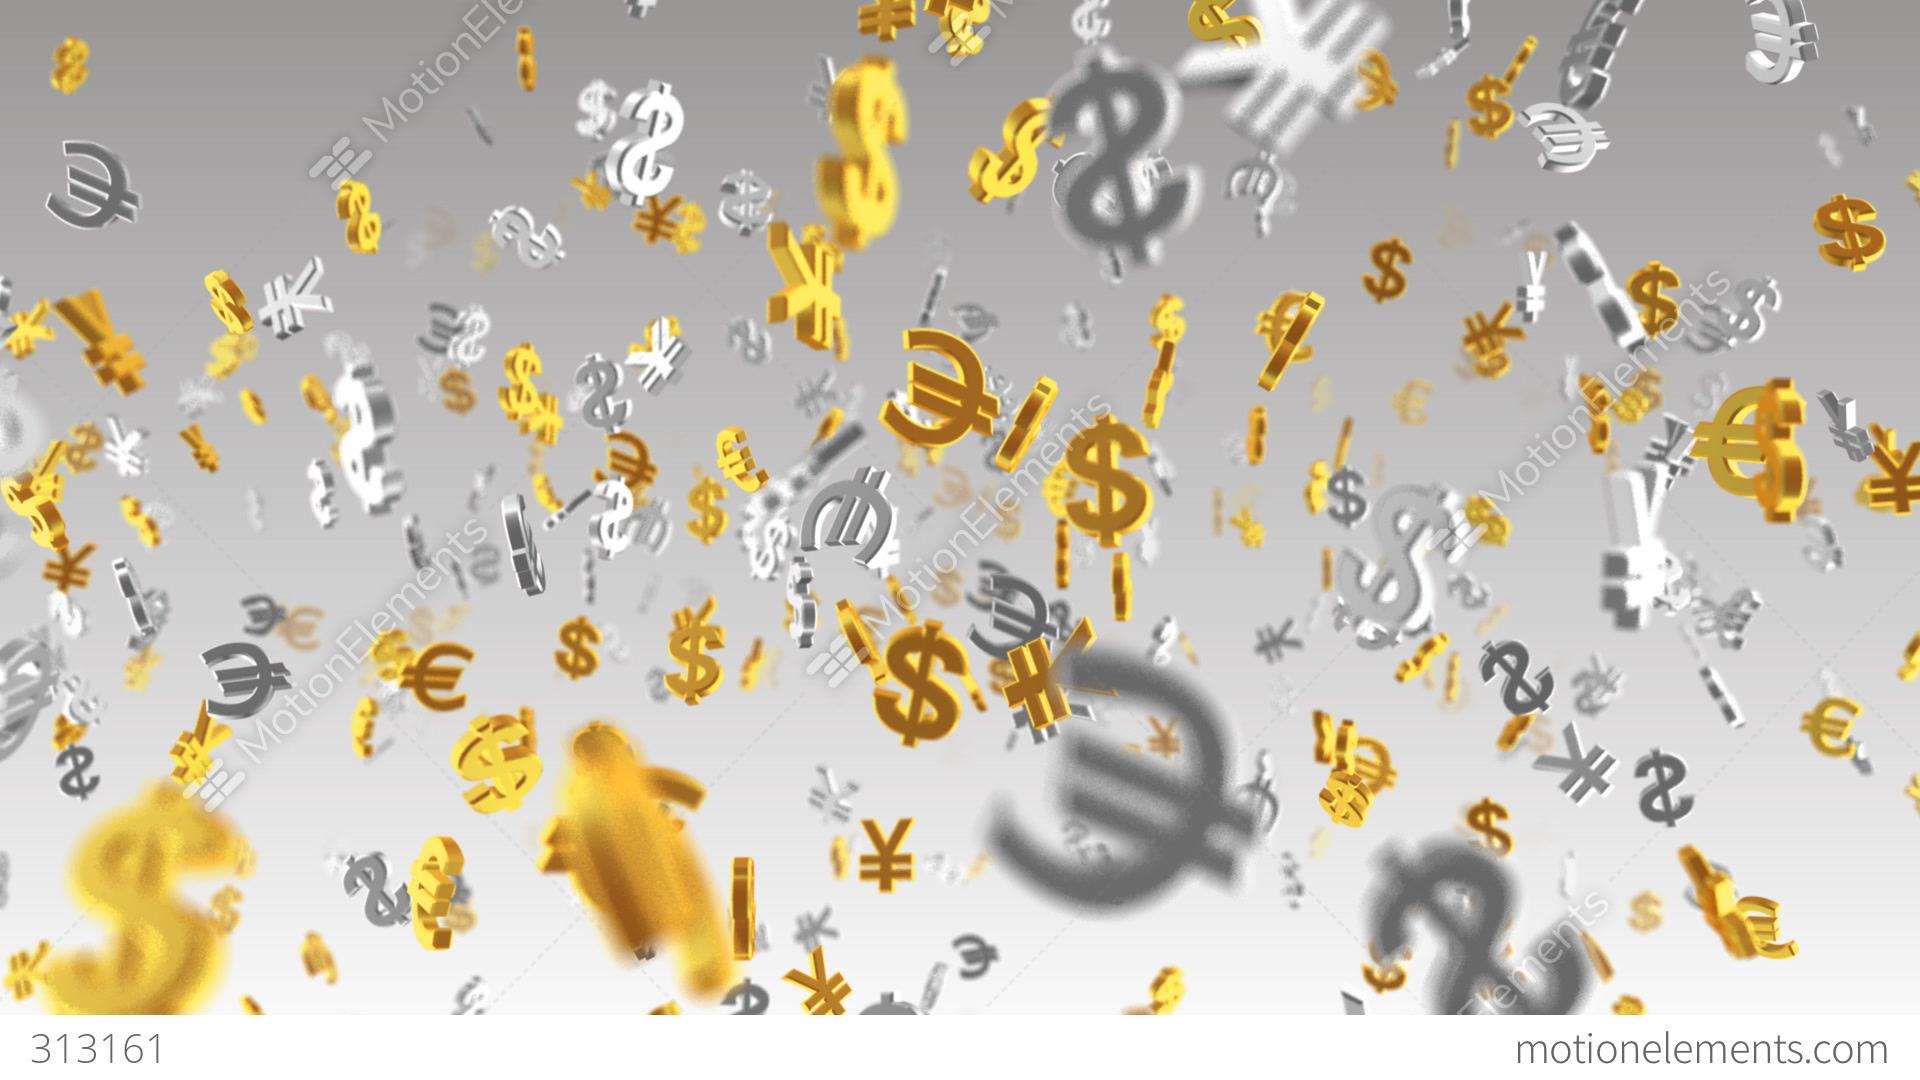 Money symbol 2a dollar euro yen w stock animation 313161 money symbol 2a dollar euro yen w stock video footage buycottarizona Gallery